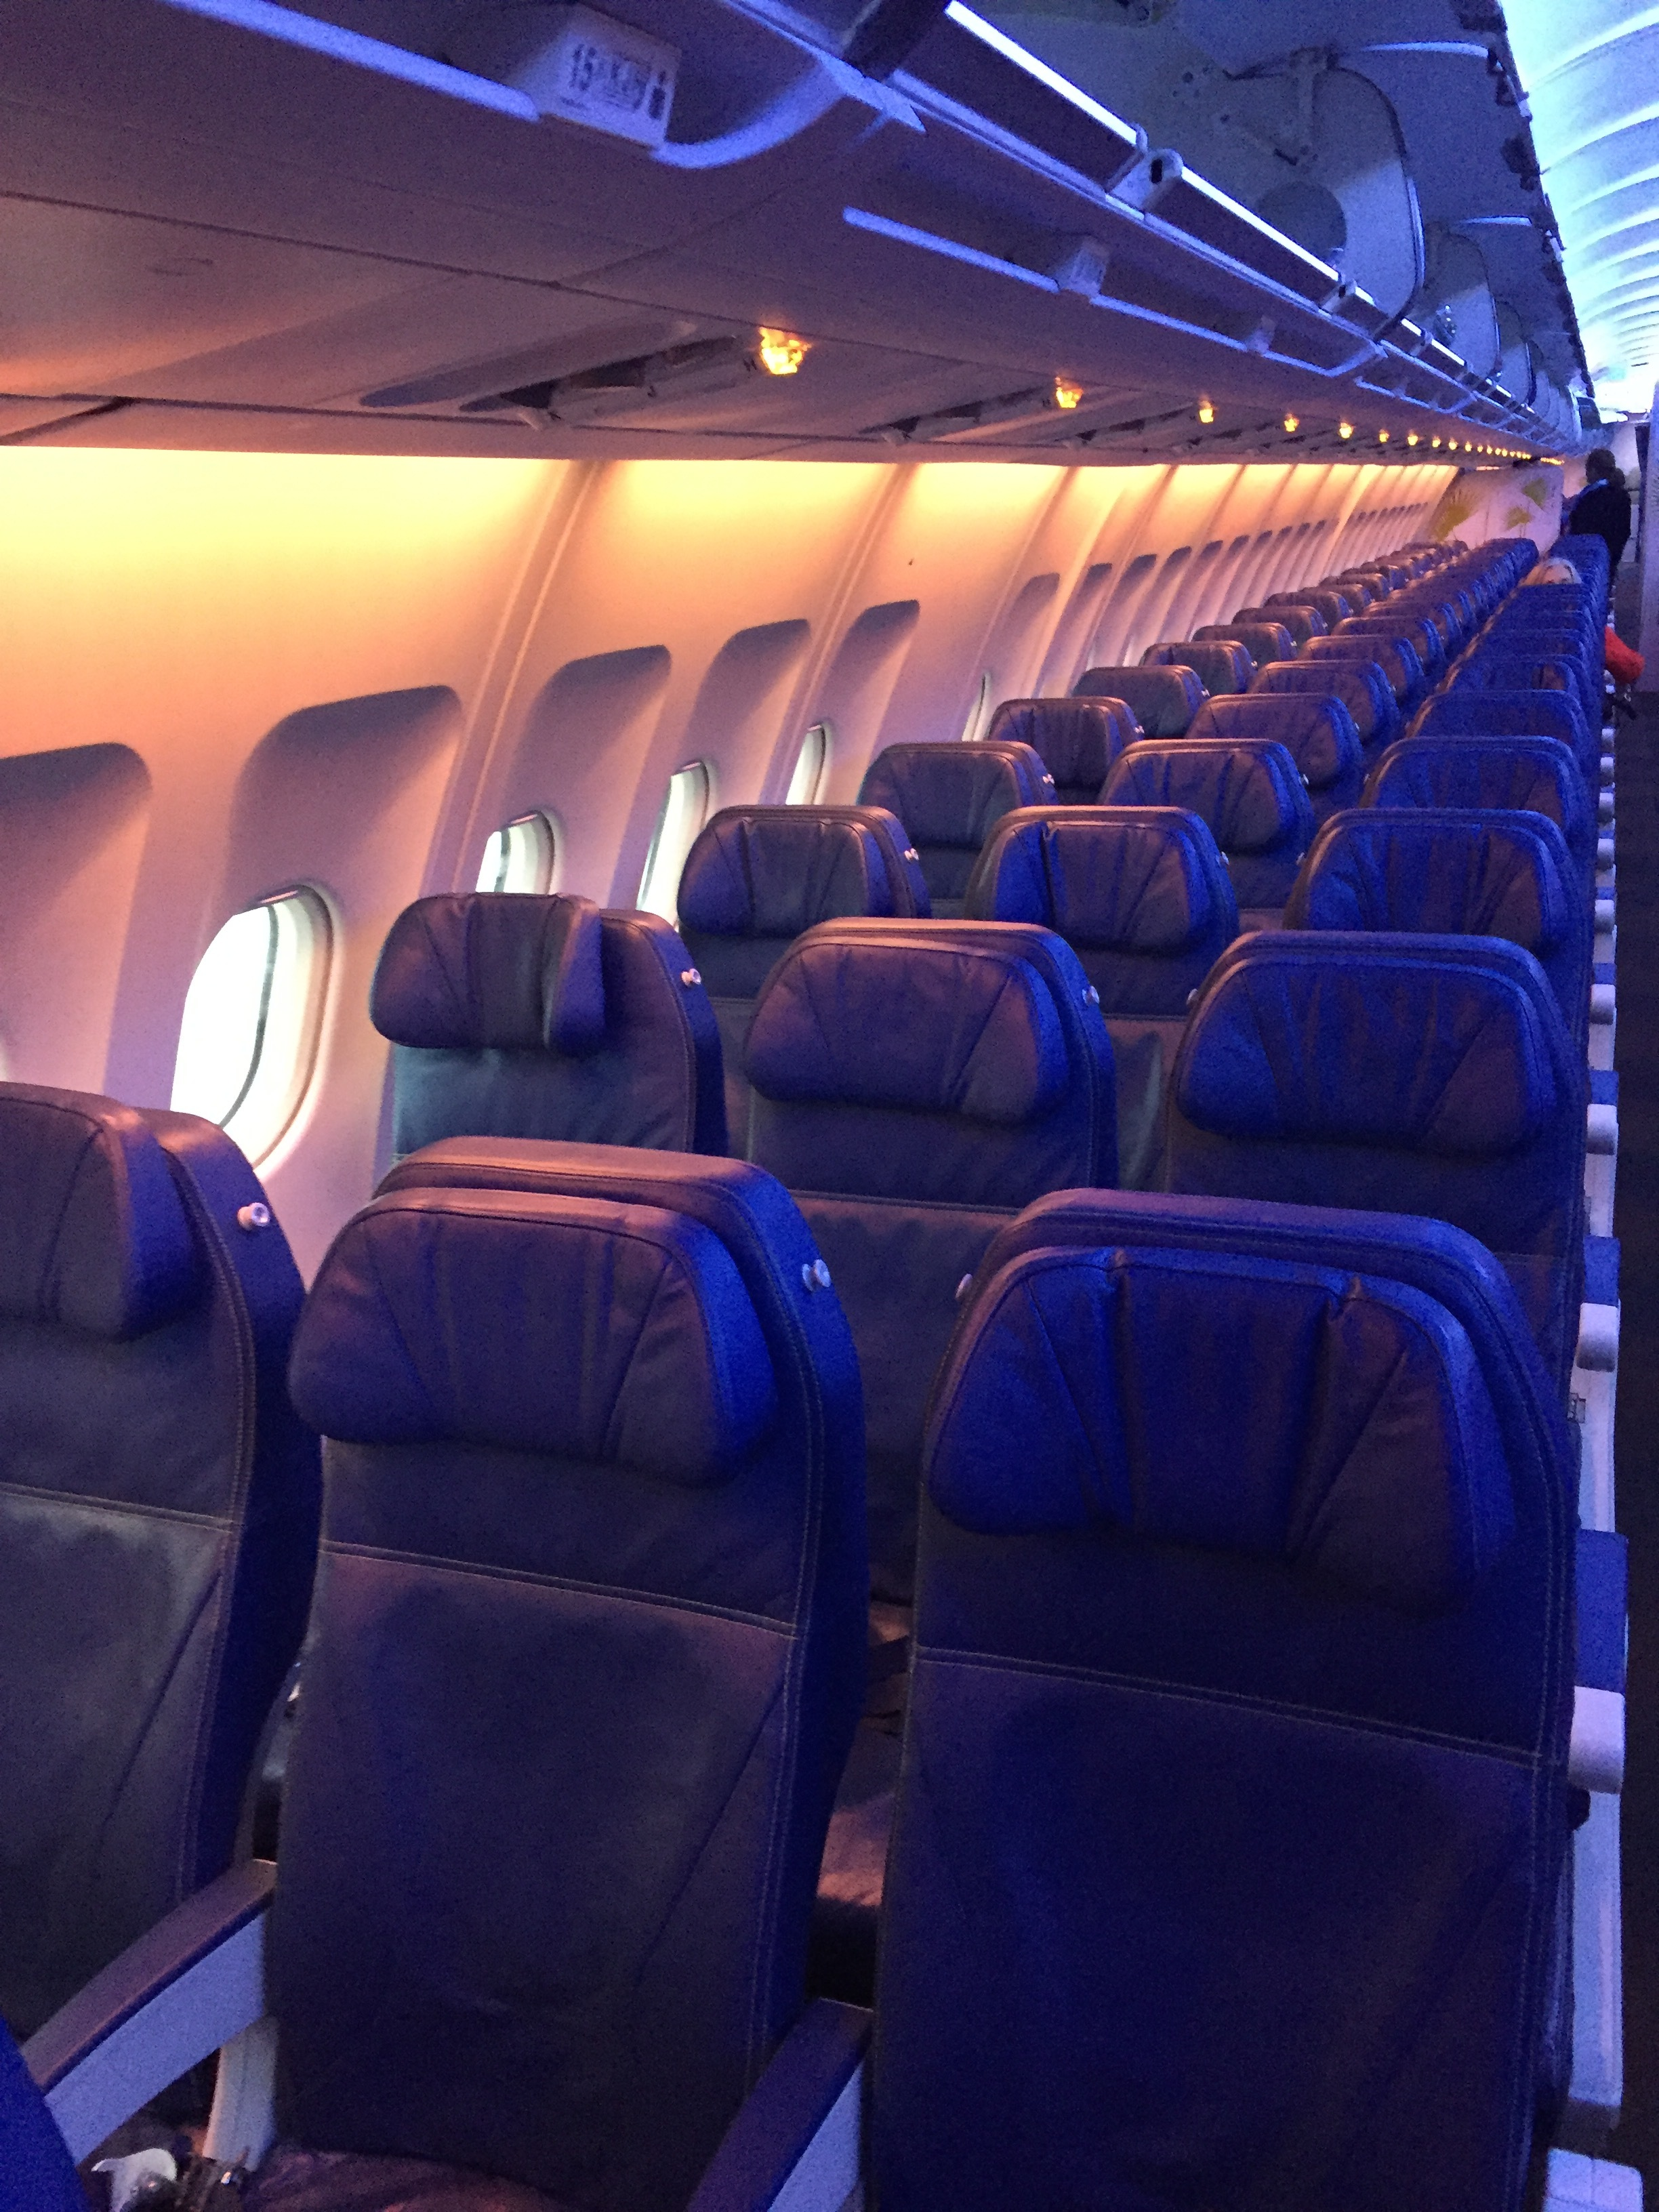 air transat economy seats.JPG